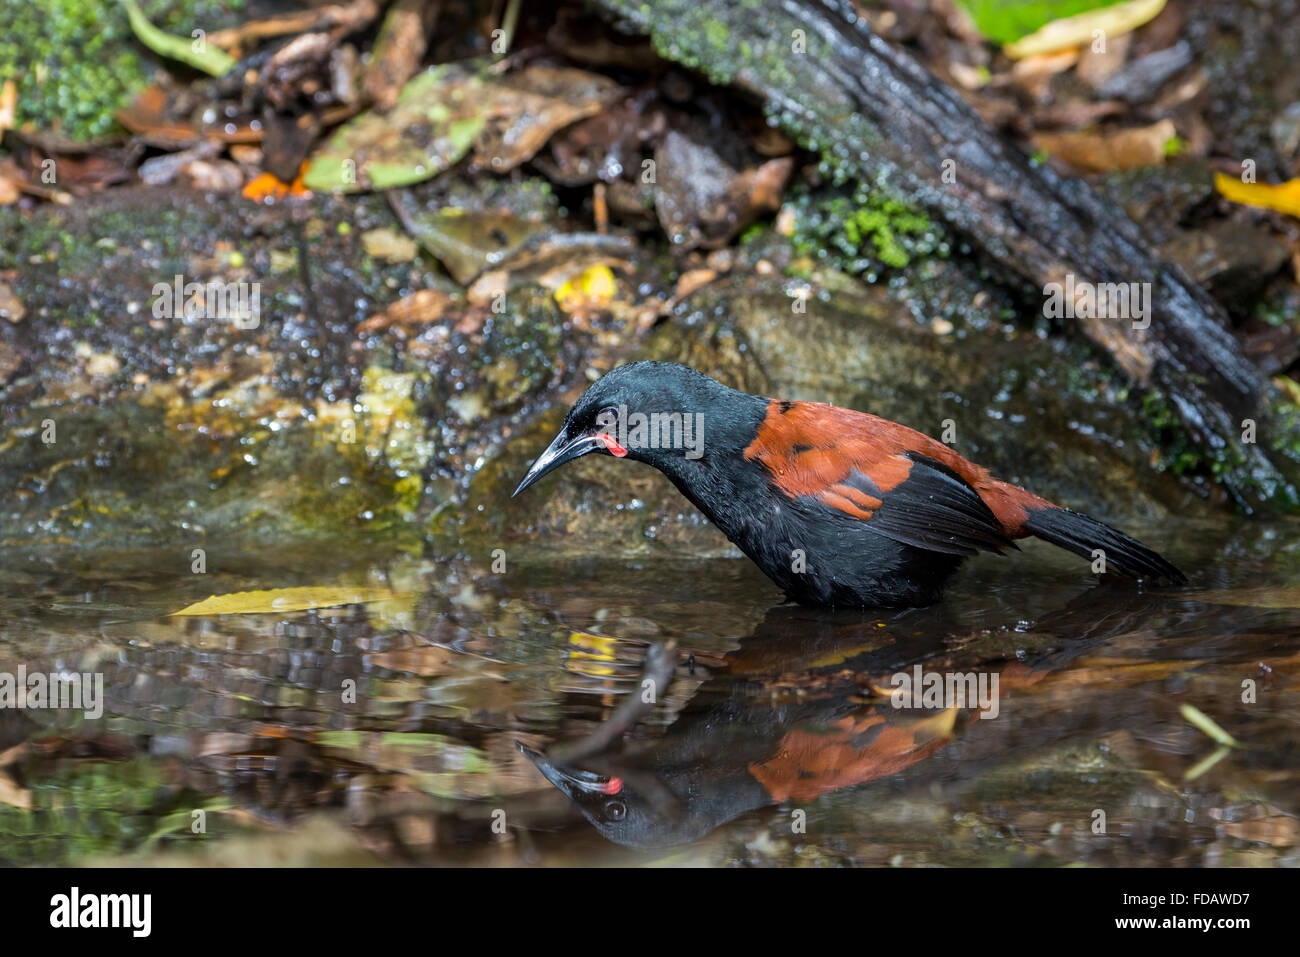 Nueva Zelandia, Marlborough Sounds, Motuara Island aka Motu Ara. Libres de predadores reserva de aves de la isla. Macho saddleback del sur de la isla. Foto de stock